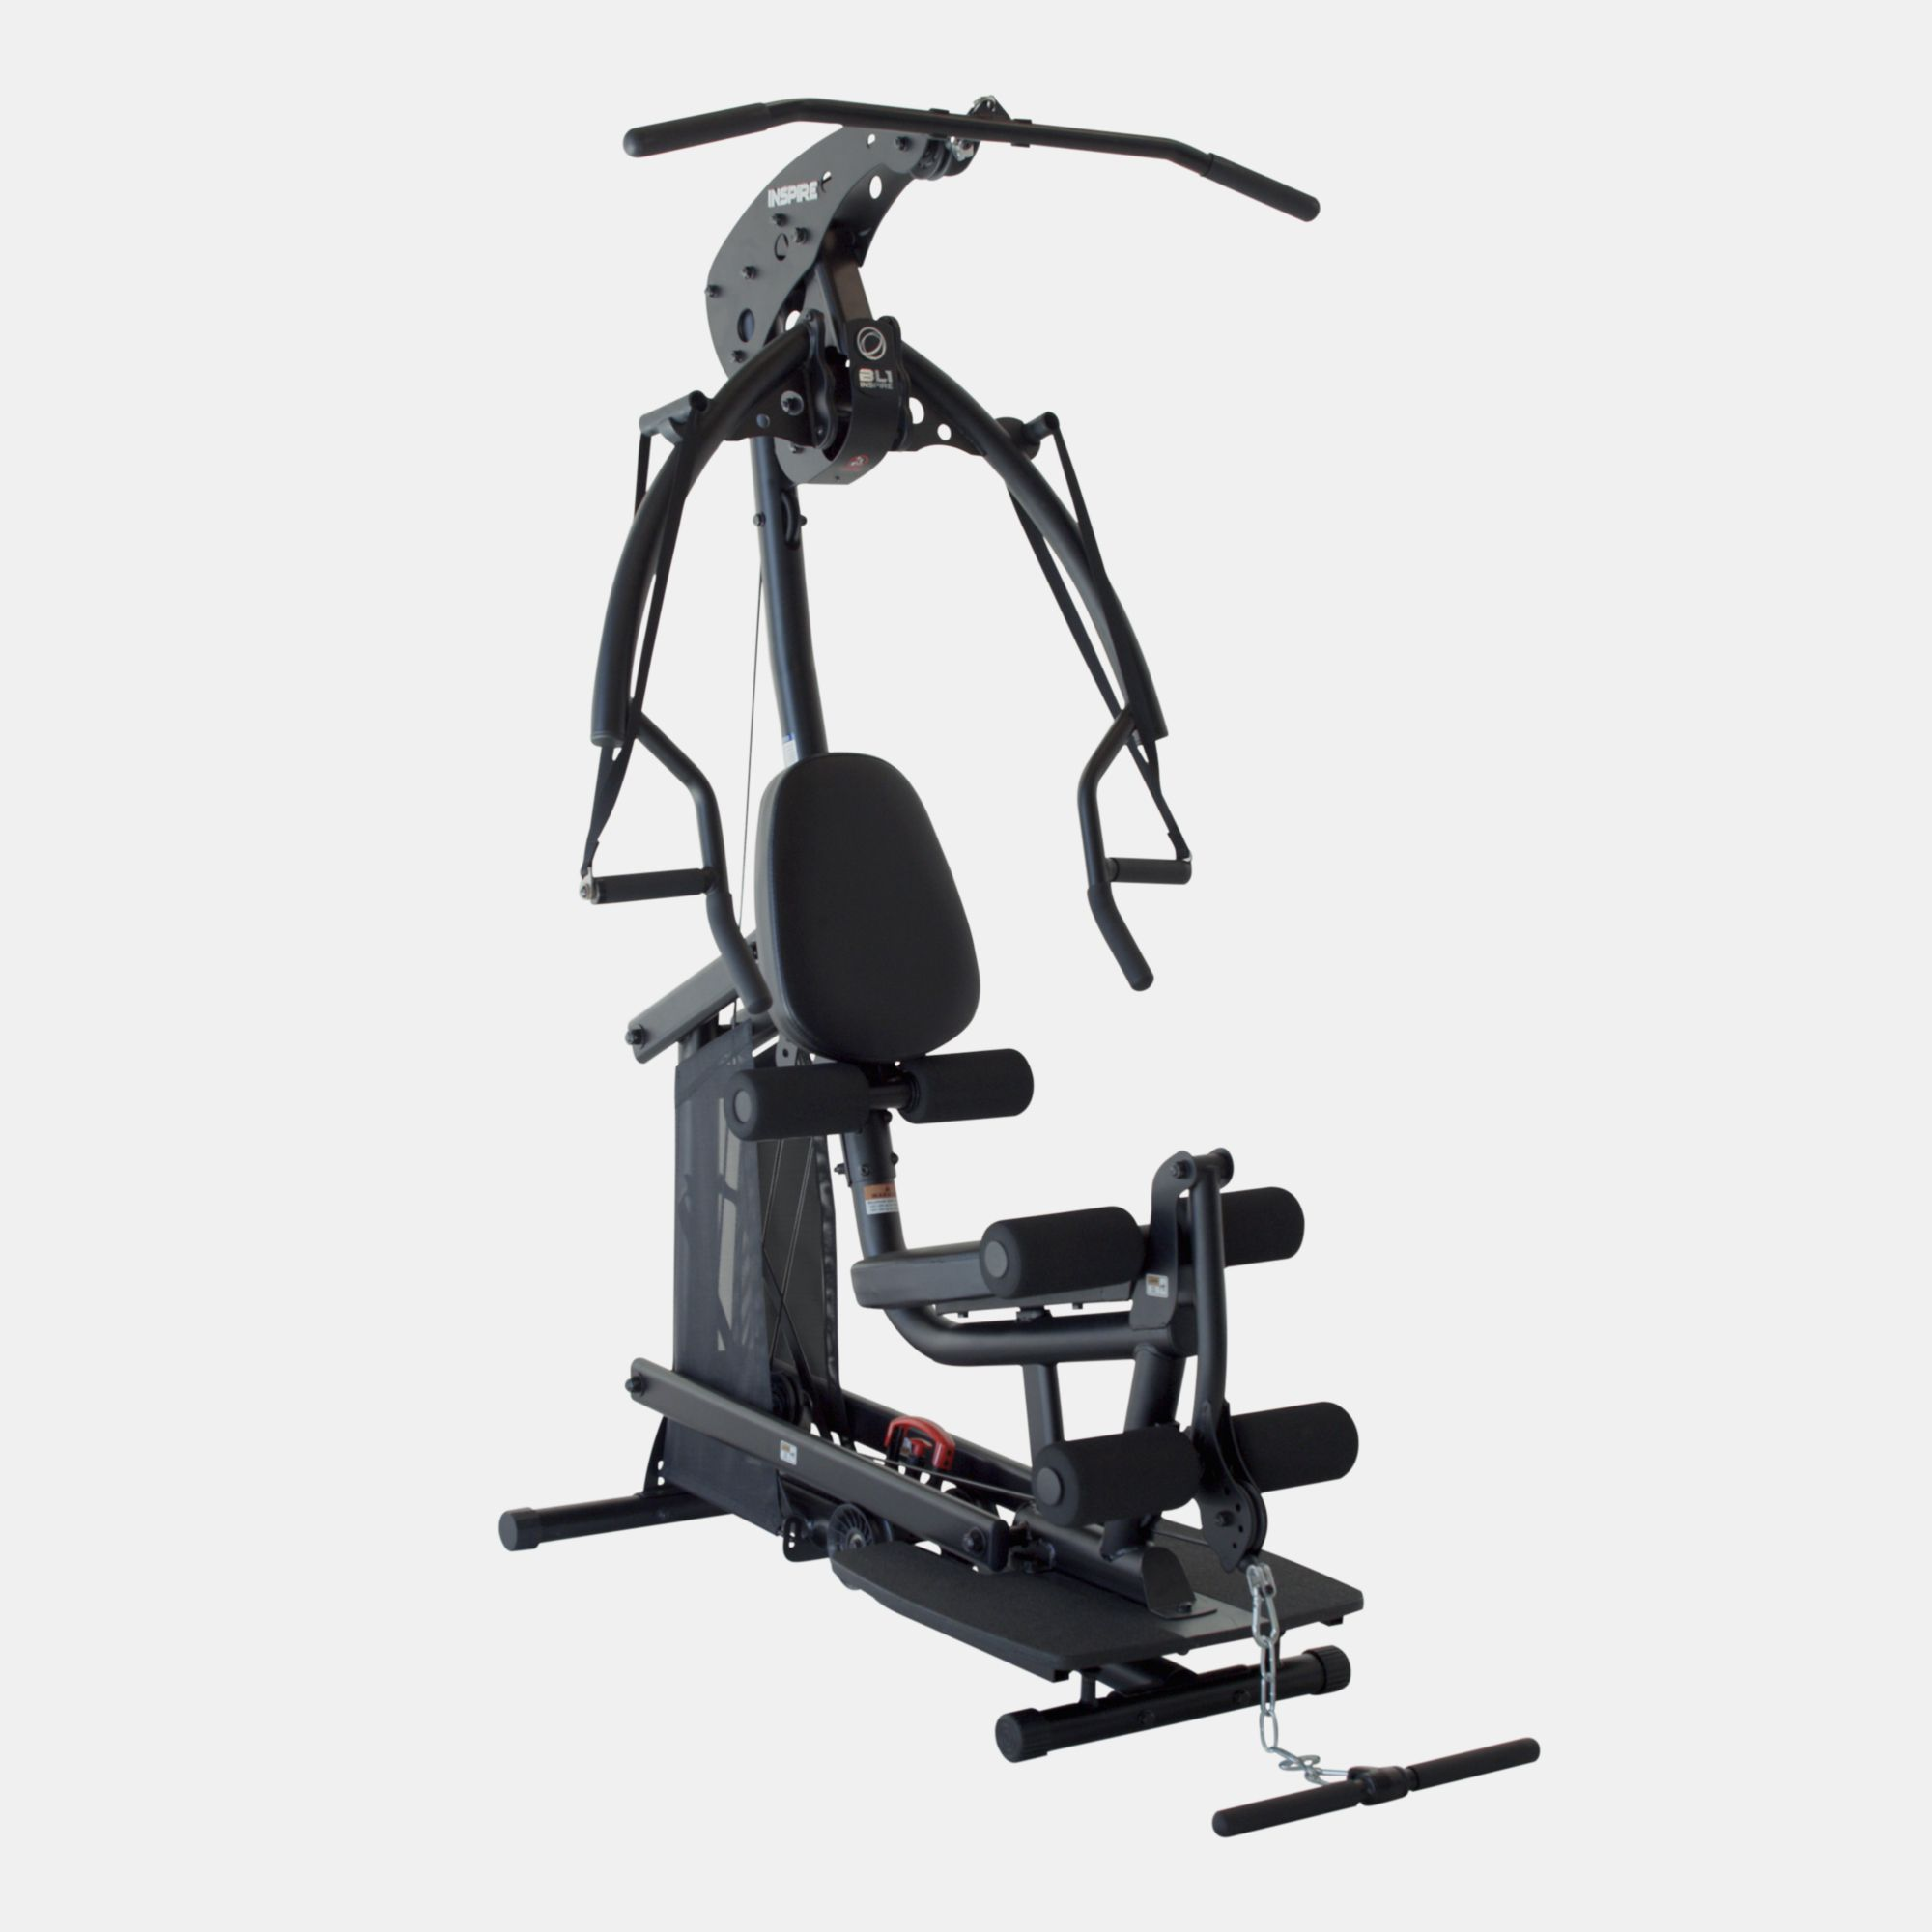 Inspire Fitness BL1 BodyLift Multi-Gym